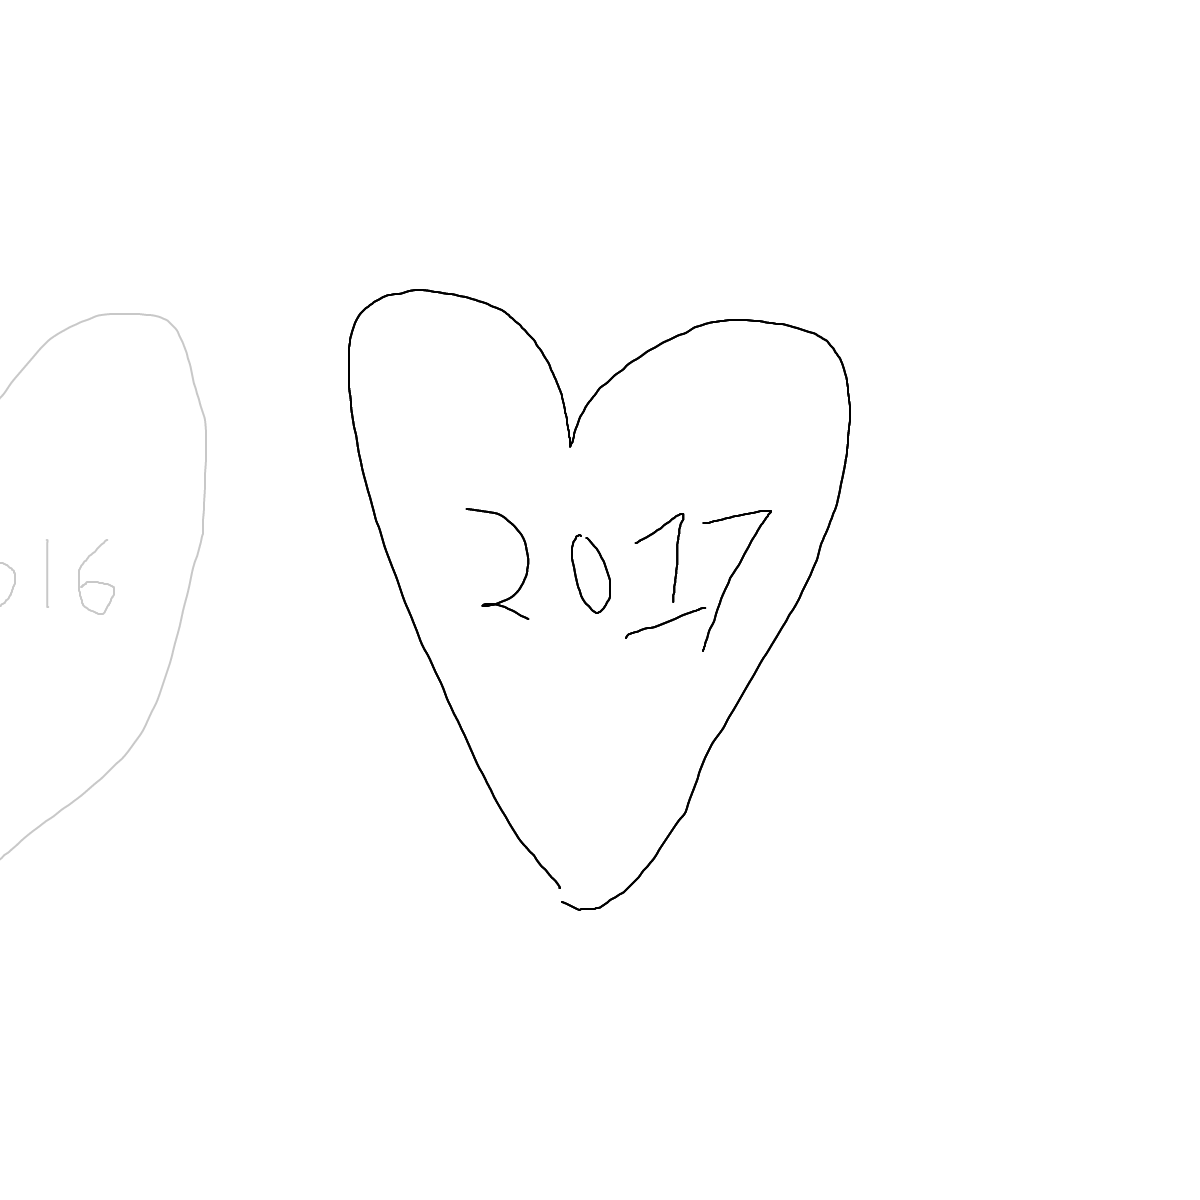 BAAAM drawing#23144 lat:64.1420364379882800lng: -21.9271030426025400